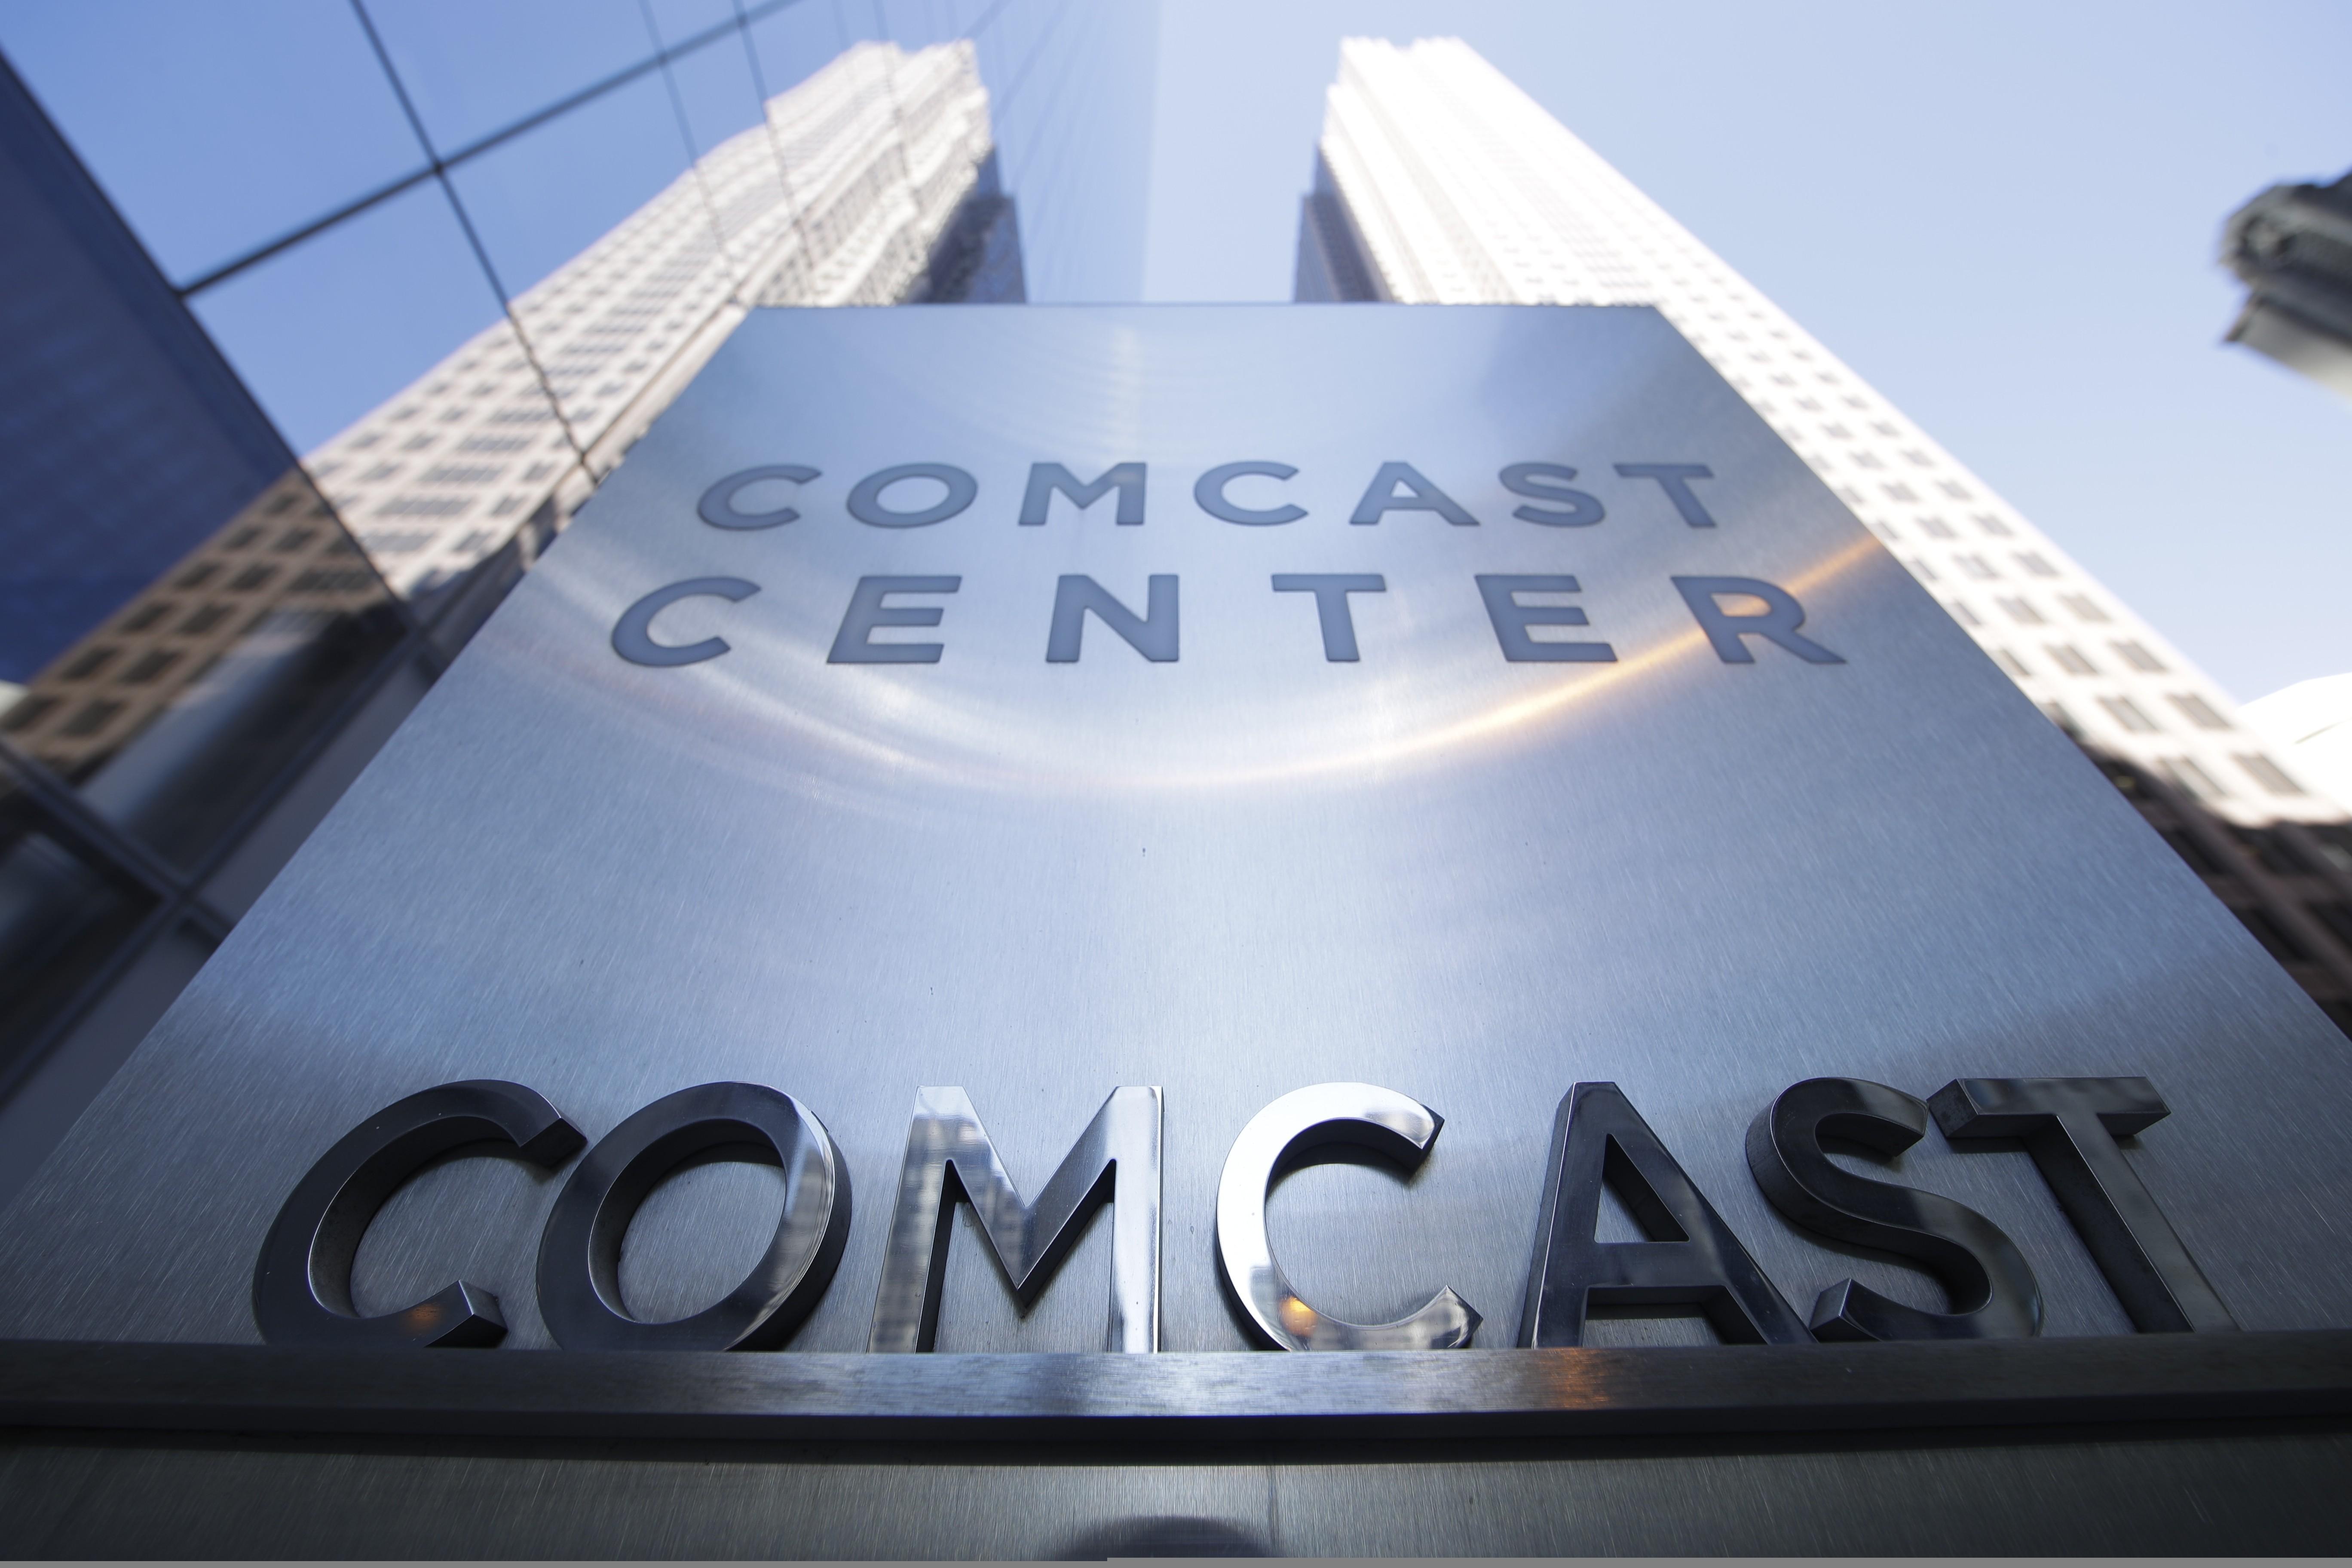 Fox accepts new Disney bid of US$71 billion, putting Comcast